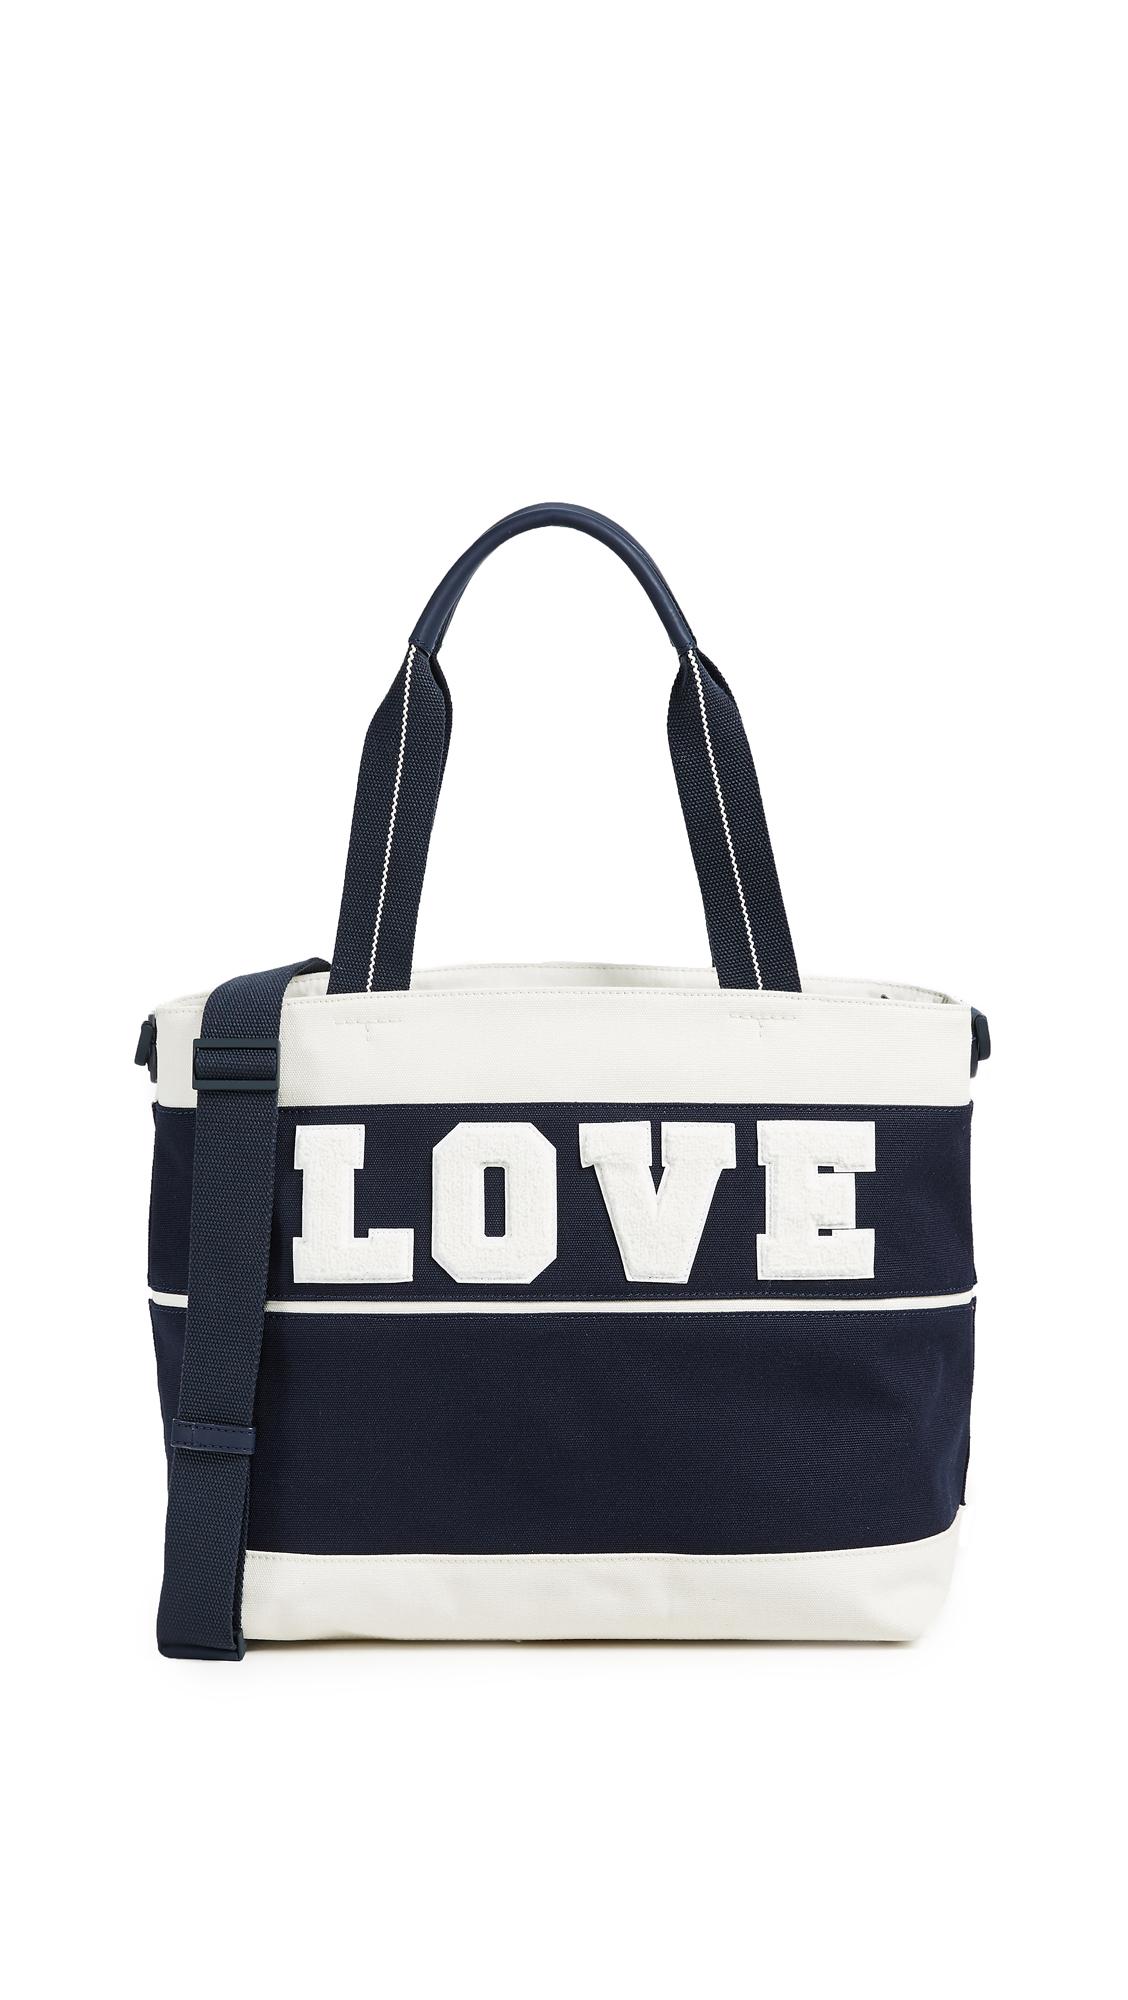 LOVE CANVAS TOTE BAG